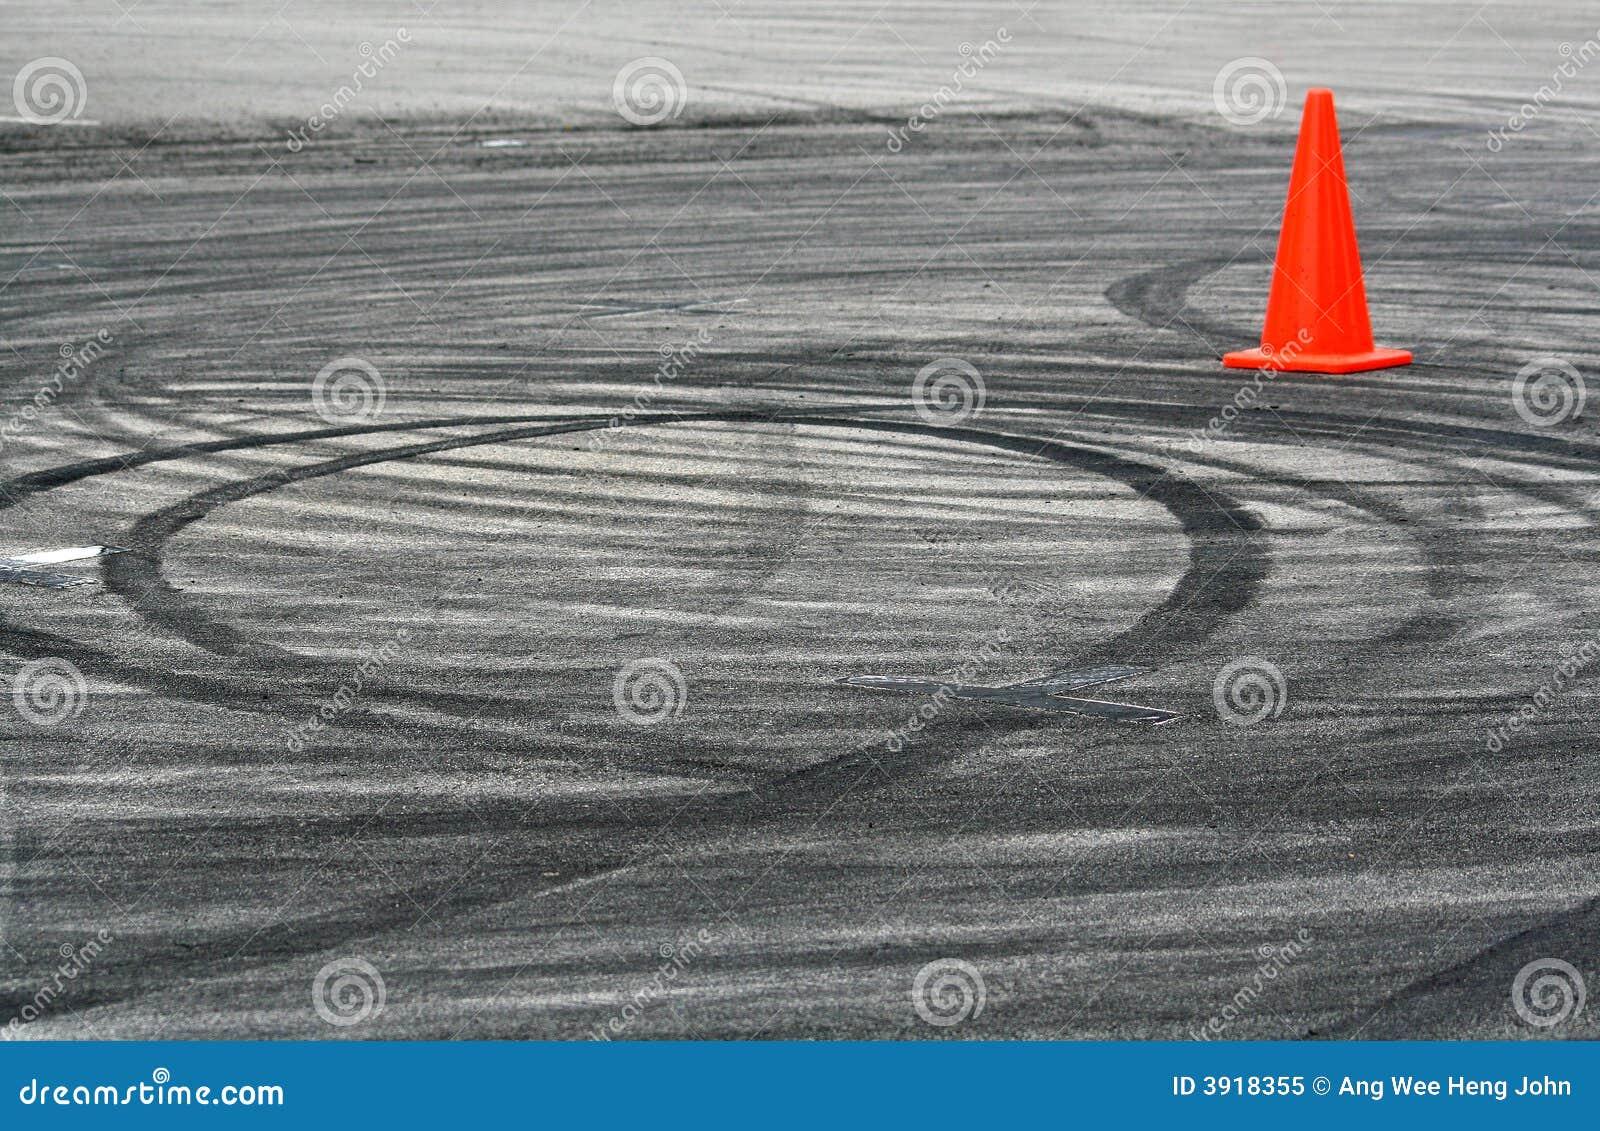 Drift marks